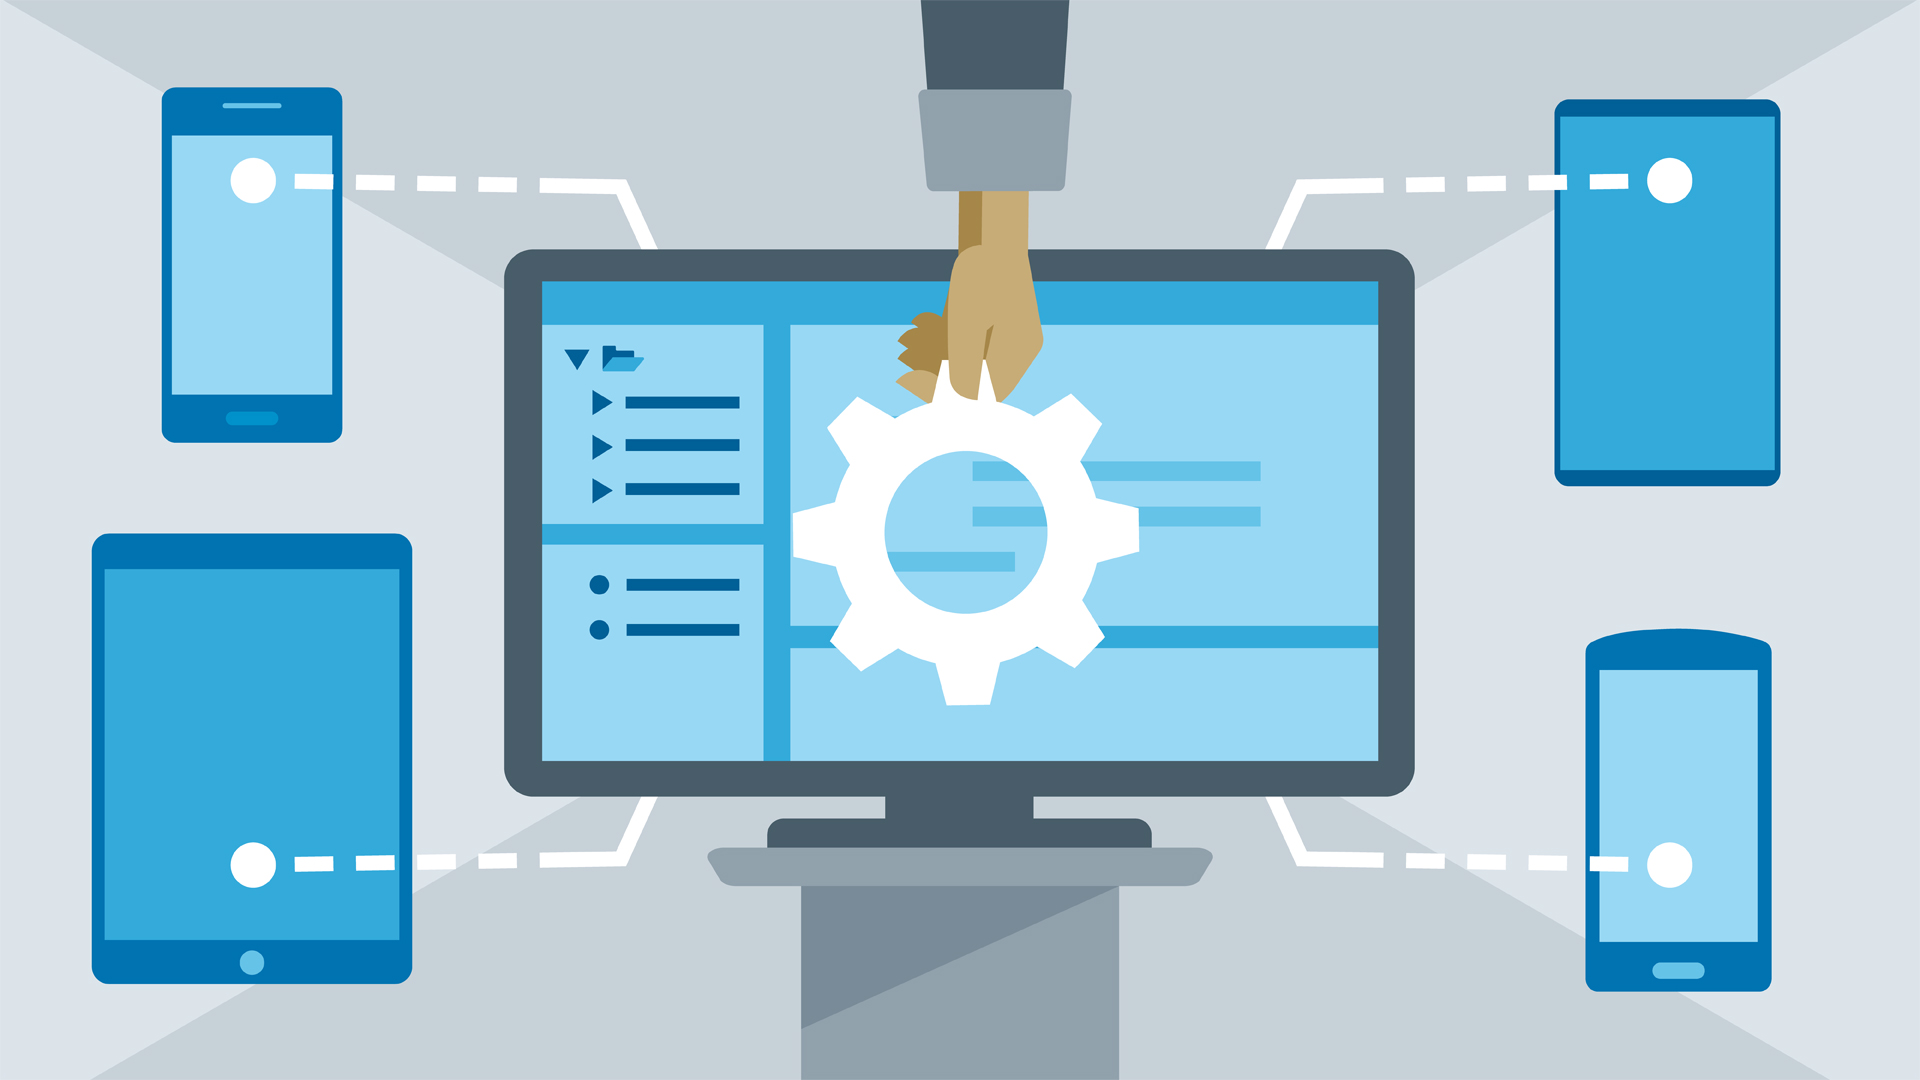 Choosing a Cross-Platform Development Tool: Cordova, Ionic